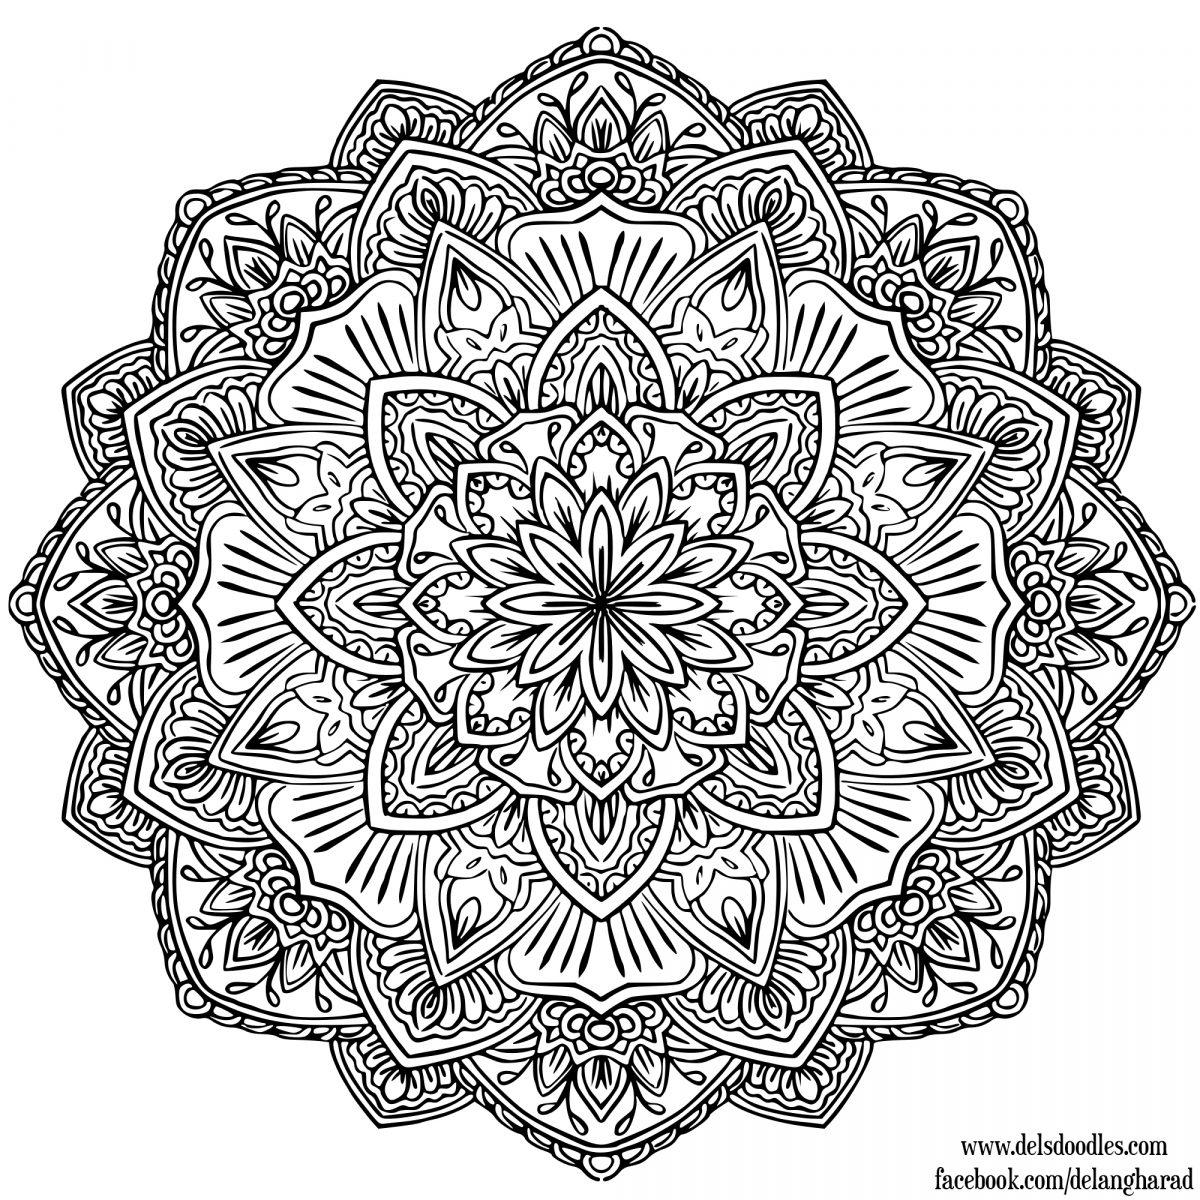 Mandala Facile A Dessiner - GreatestColoringBook.com